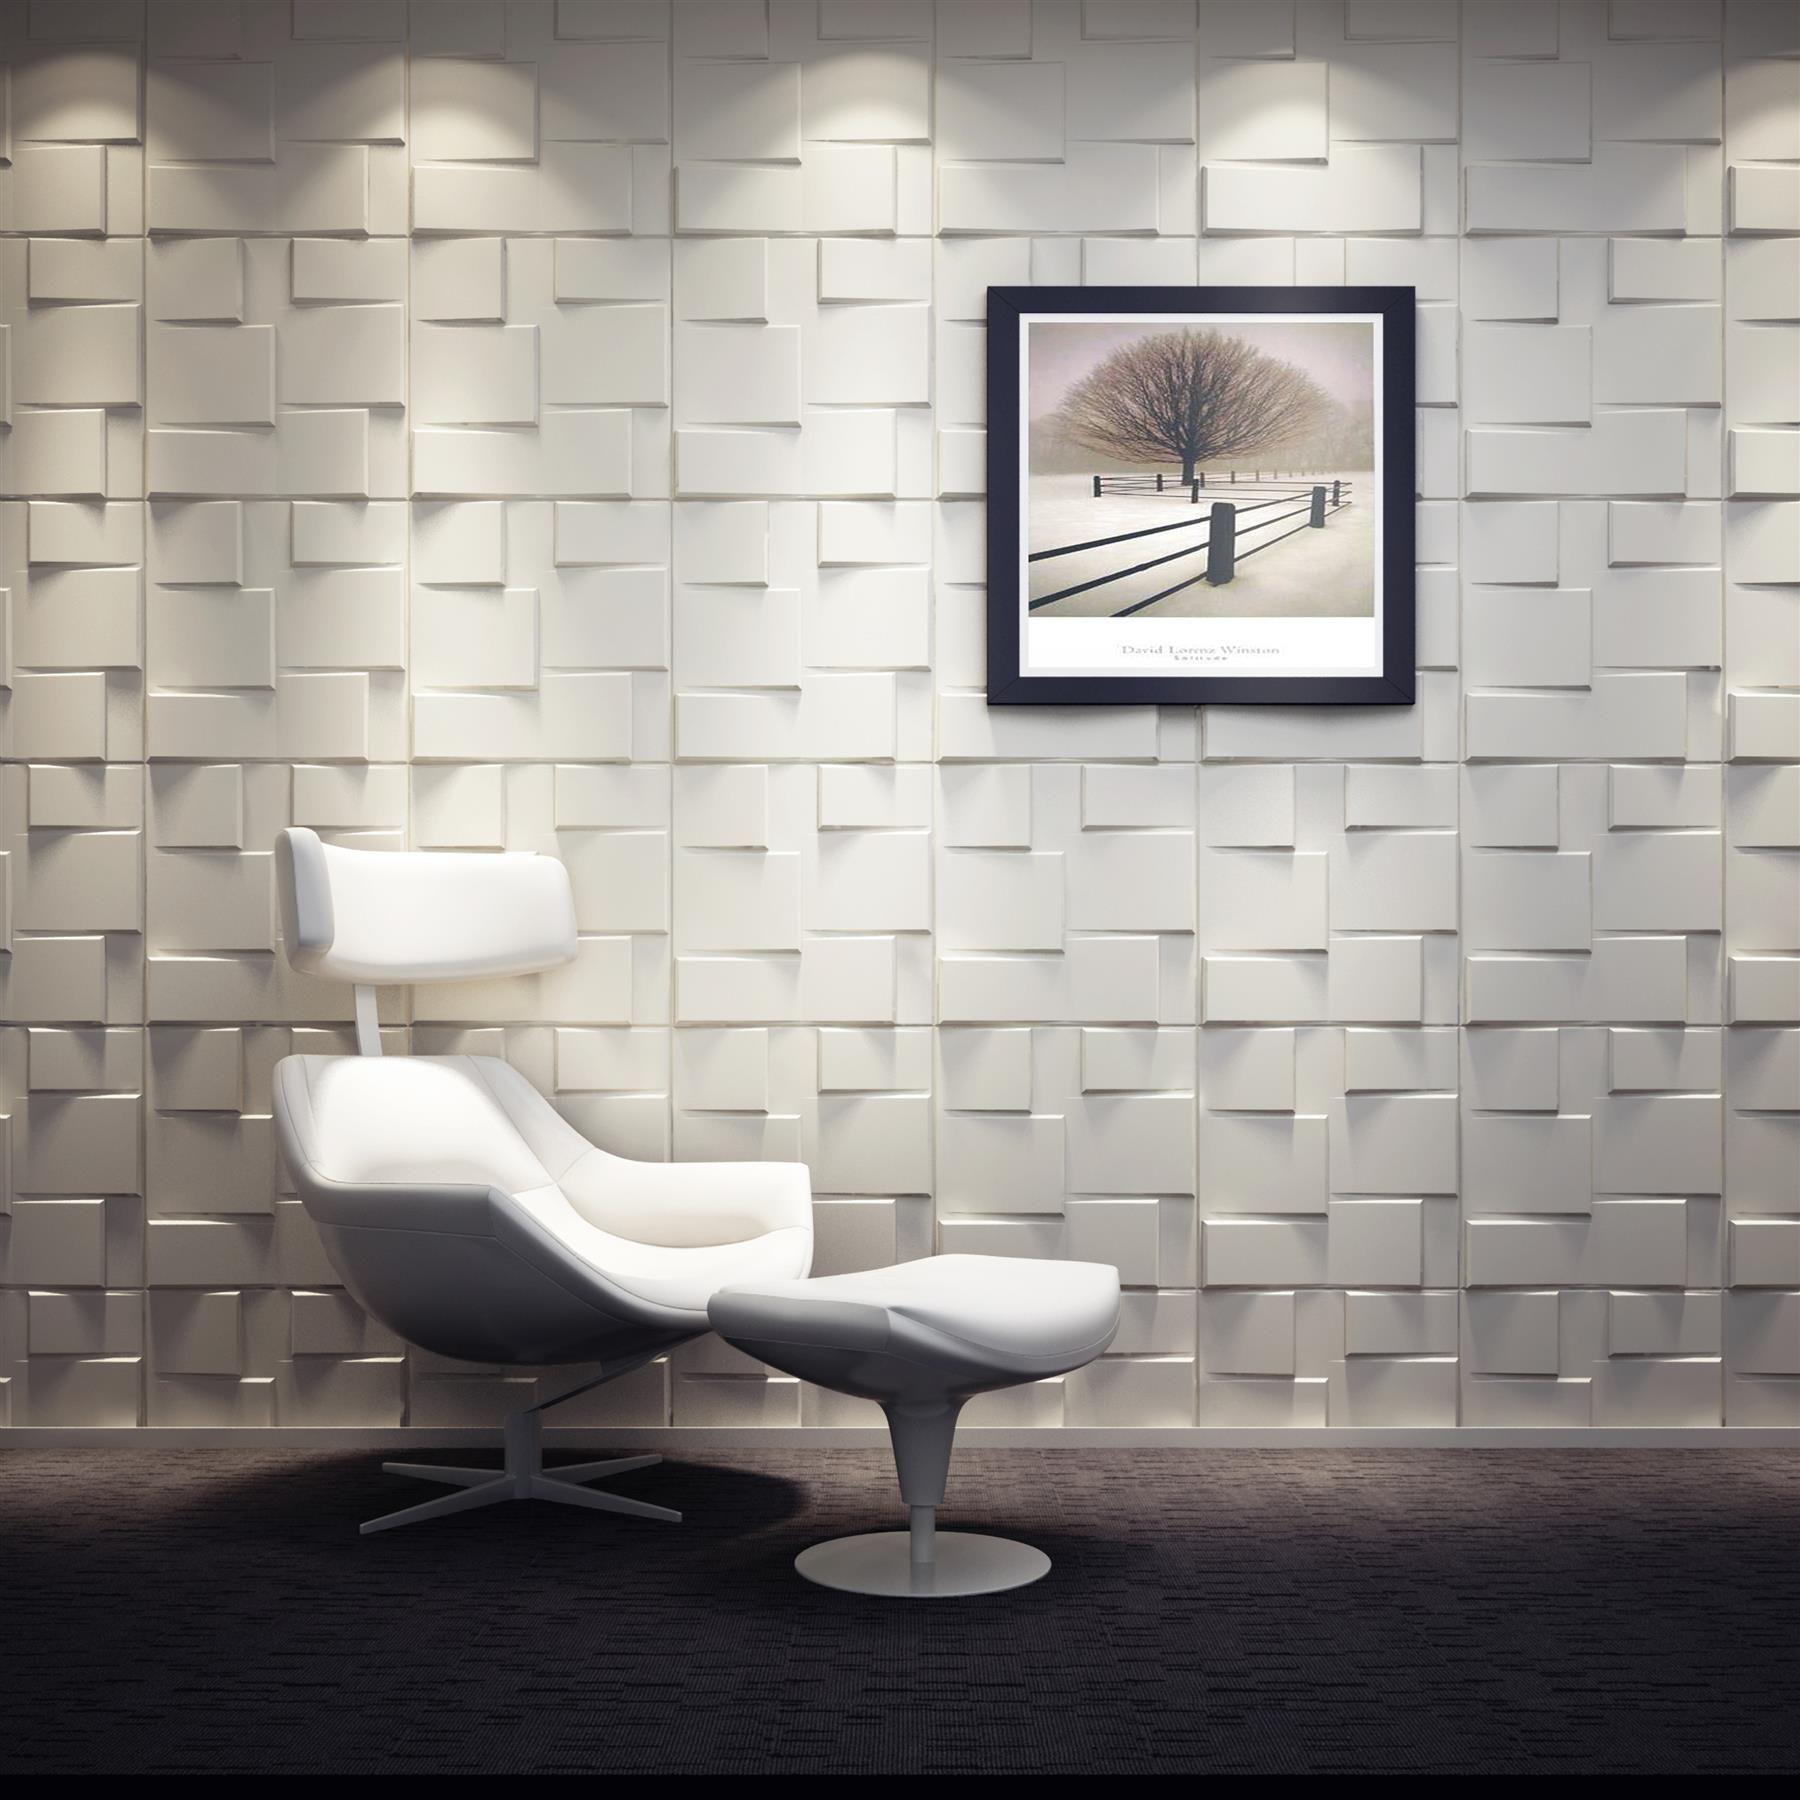 Glo Panels Pvt Ltd | Wall highligher | Pinterest | Walls